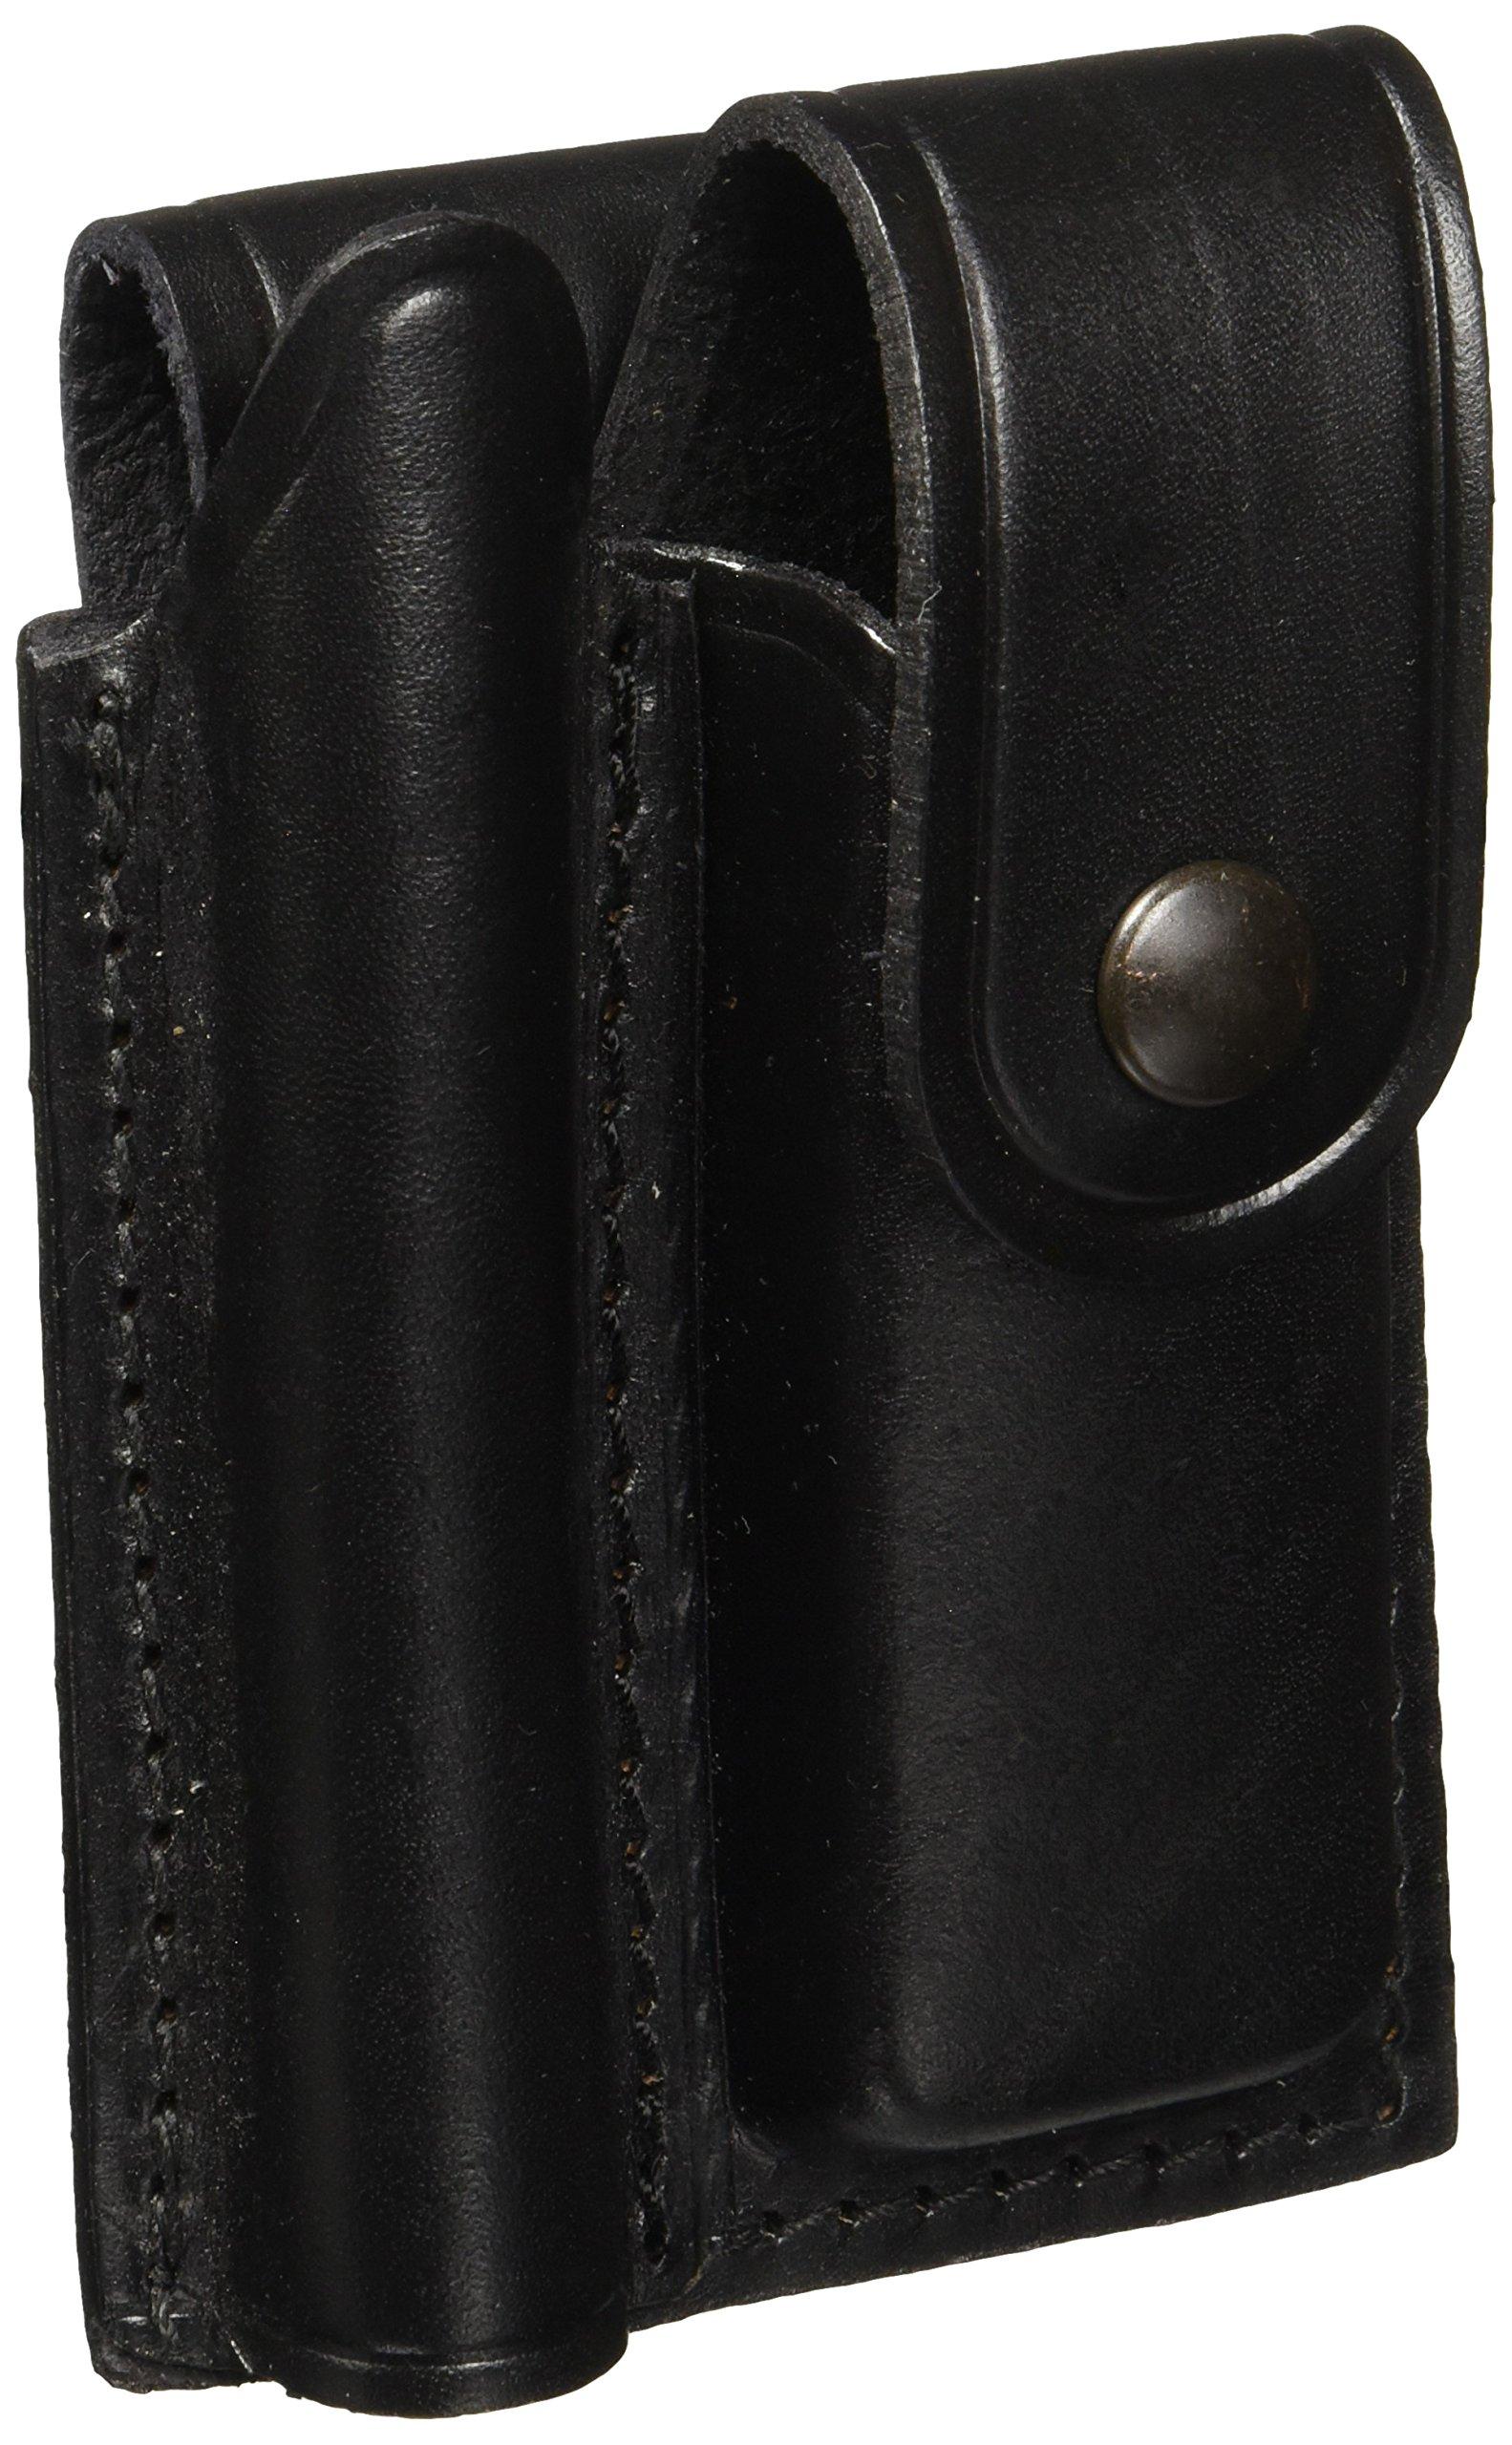 Maglite Mini Maglite/Pocket Knife Leather Holster, Black by MagLite